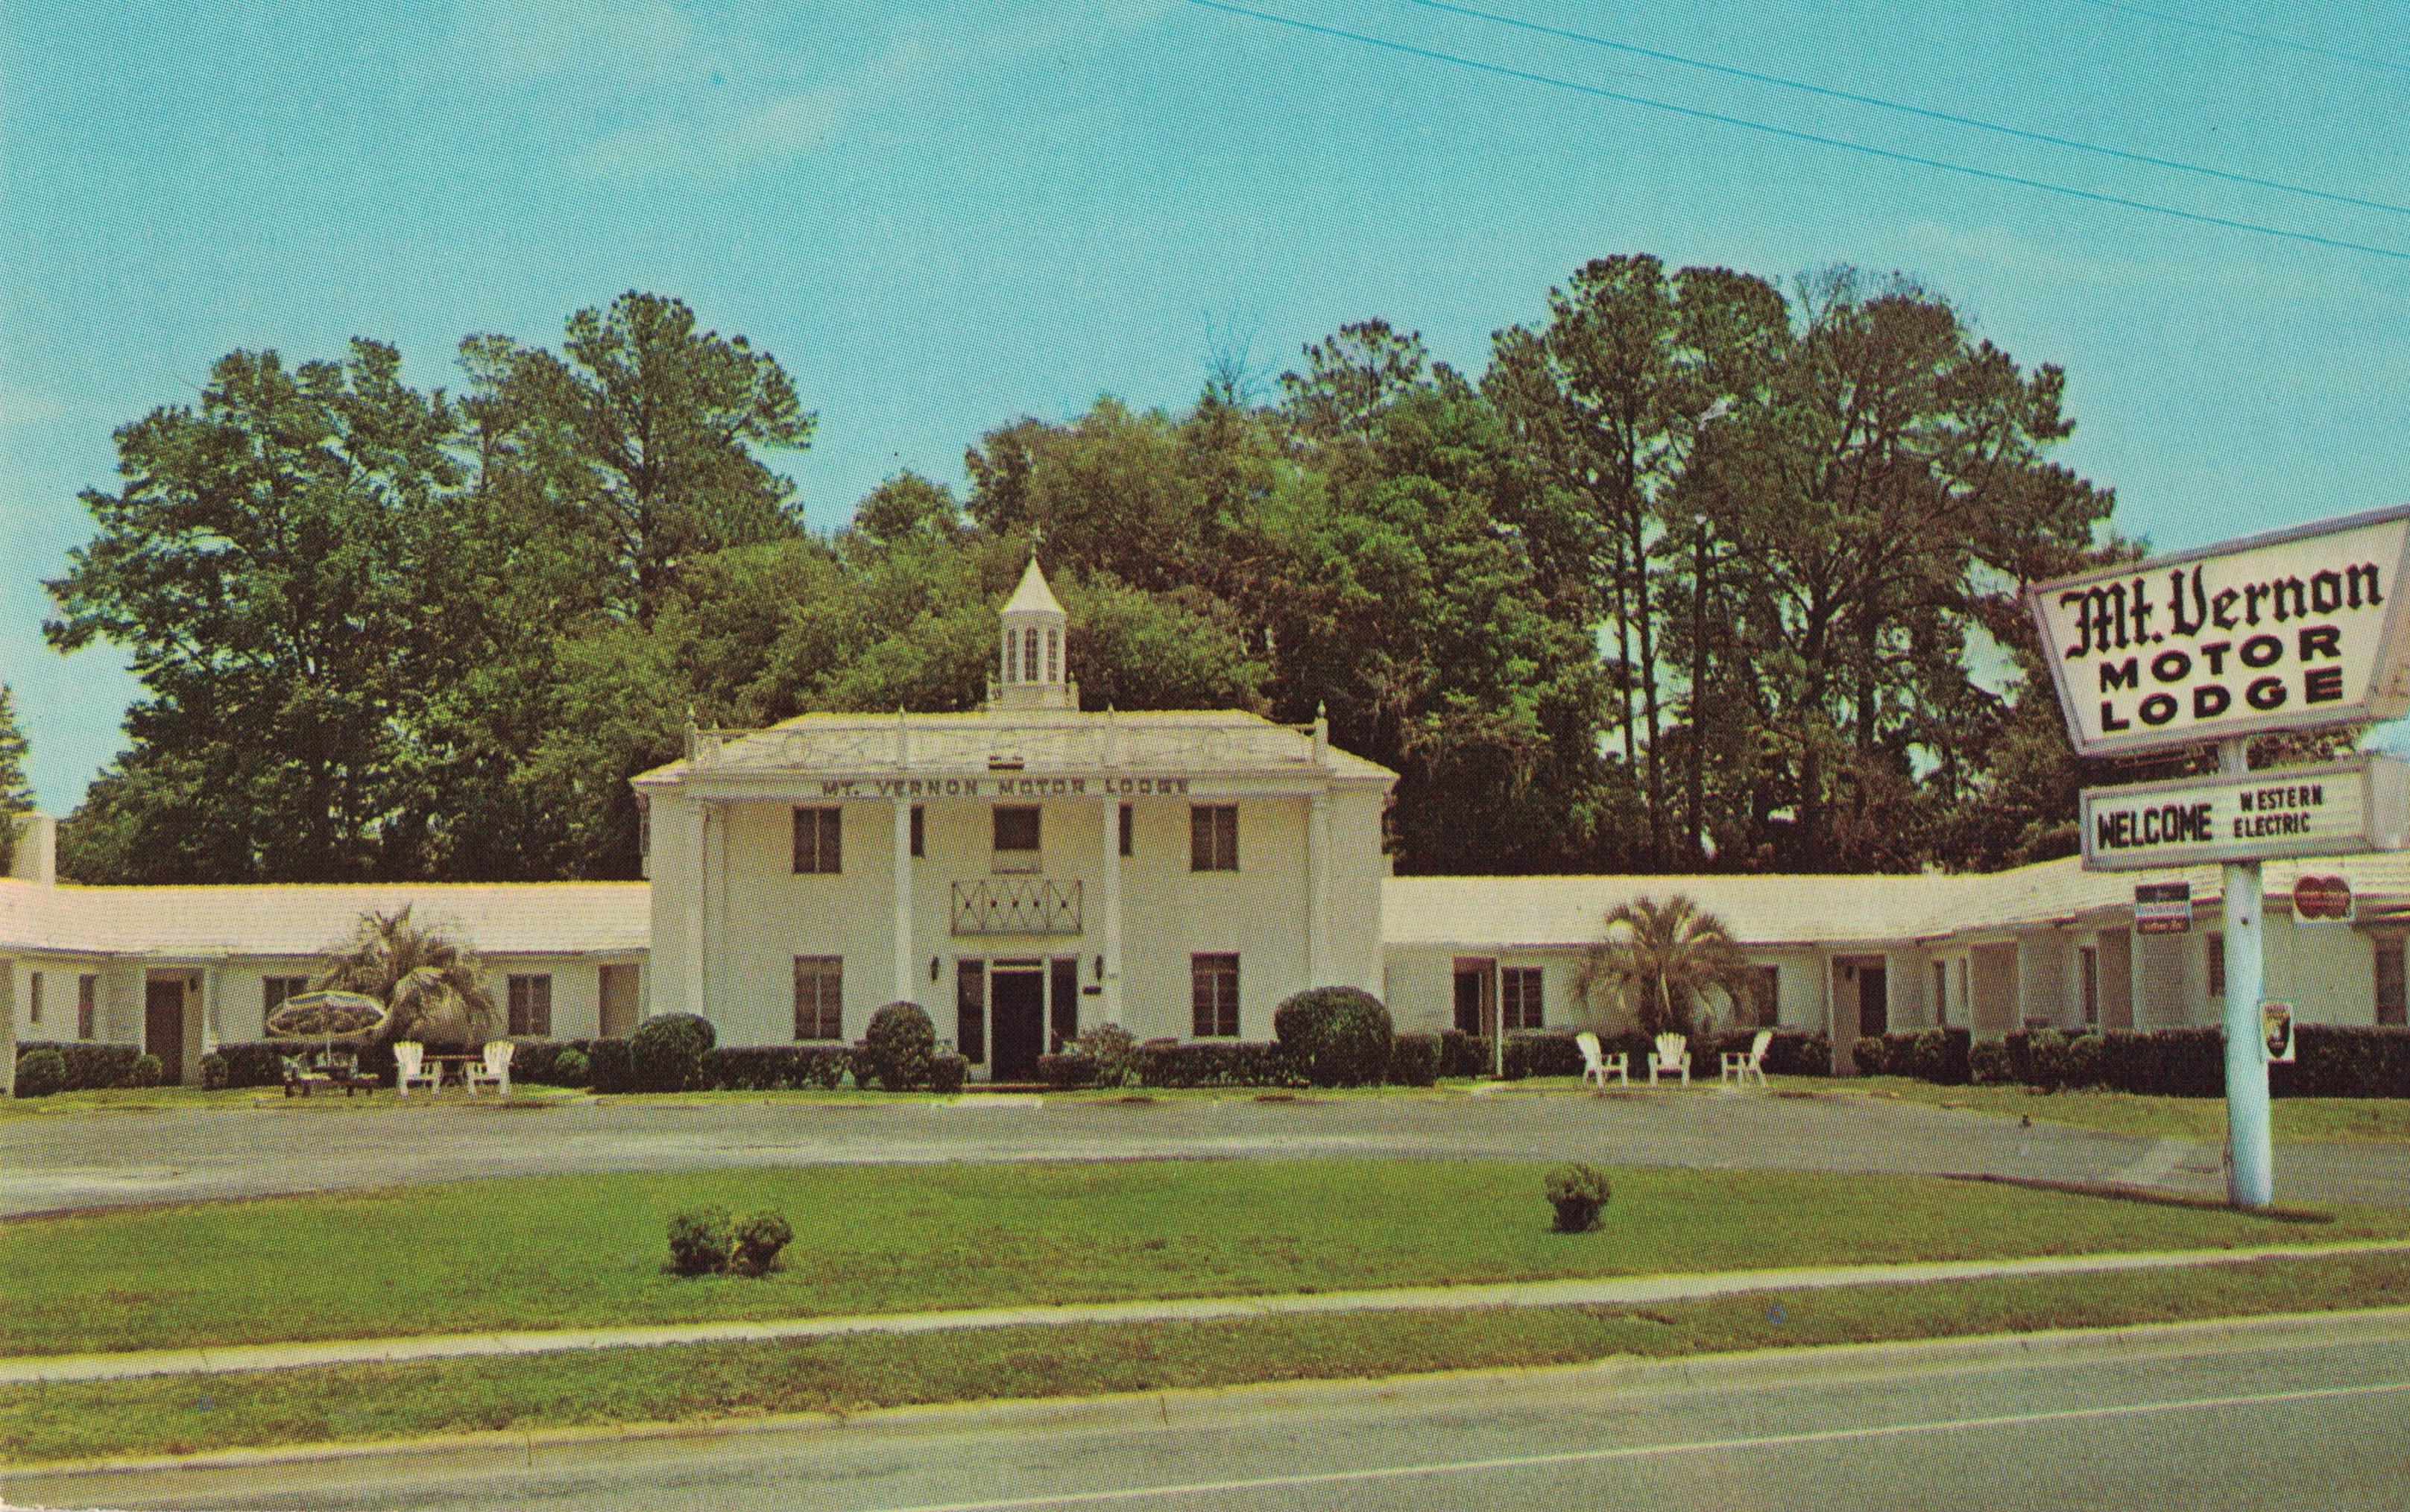 Mount Vernon Motor Lodge | jaxpsychogeo